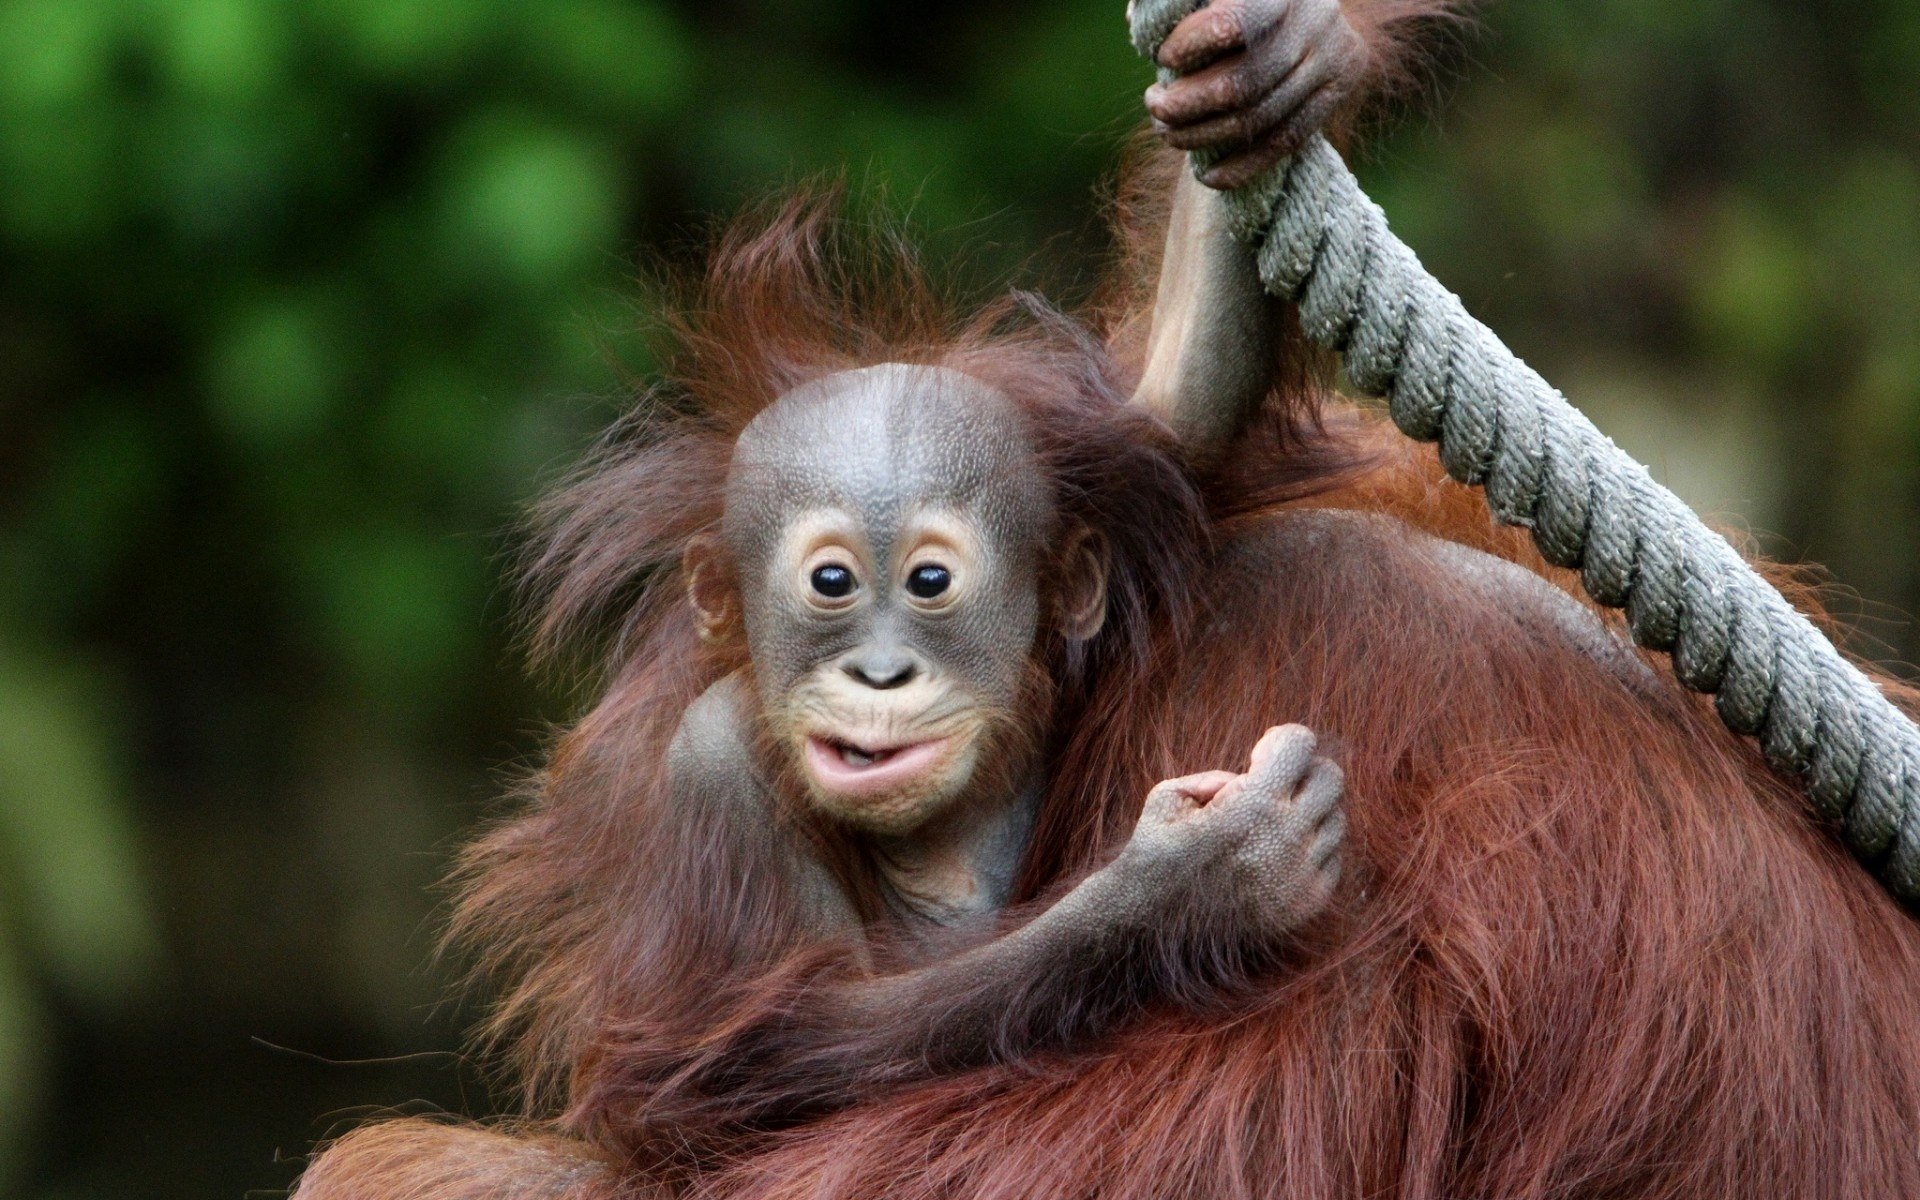 Cute Baby Monkeys Wallpaper Orangutan Hd Wallpaper Background Image 1920x1200 Id